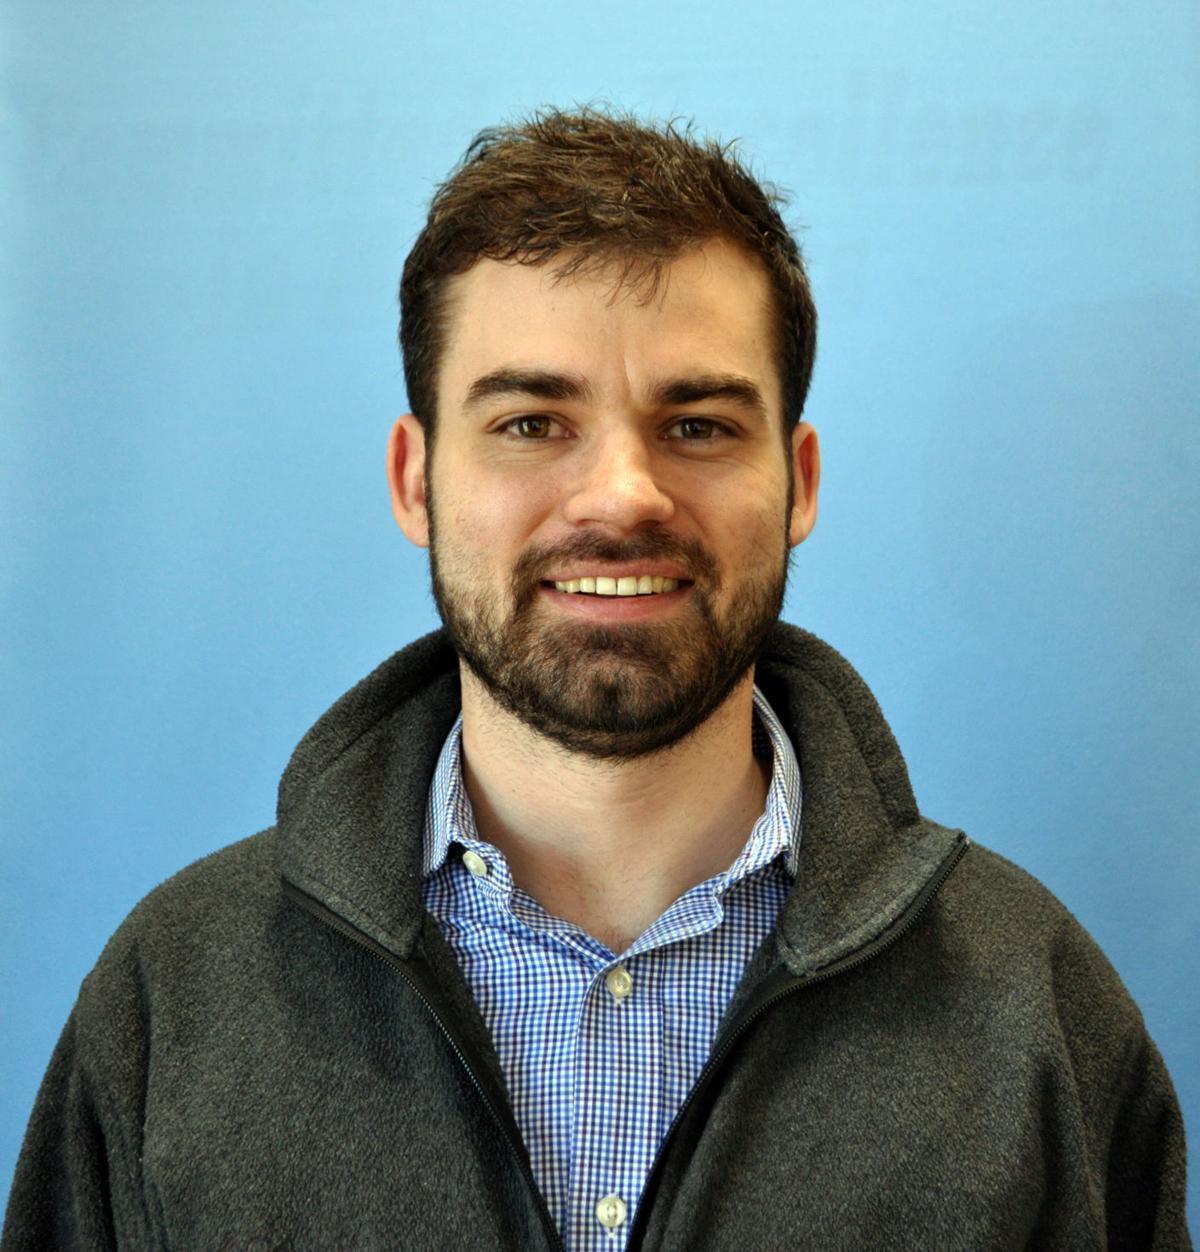 Jake Carlisle joins Talladega Superspeedway as director of ticketing